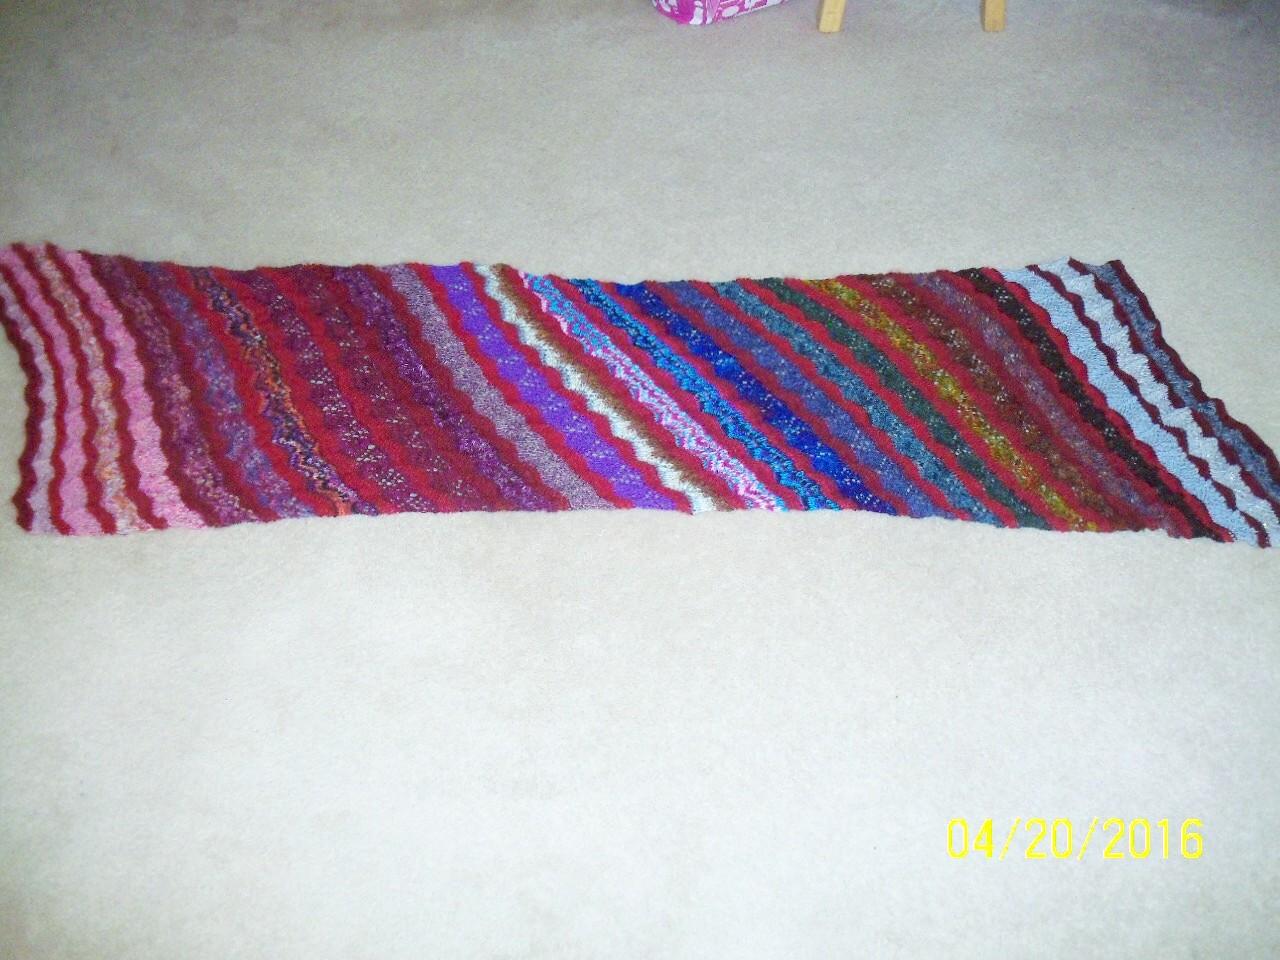 Lilie\'s Knitting Blog: Test Lamina Wrap - DONE!